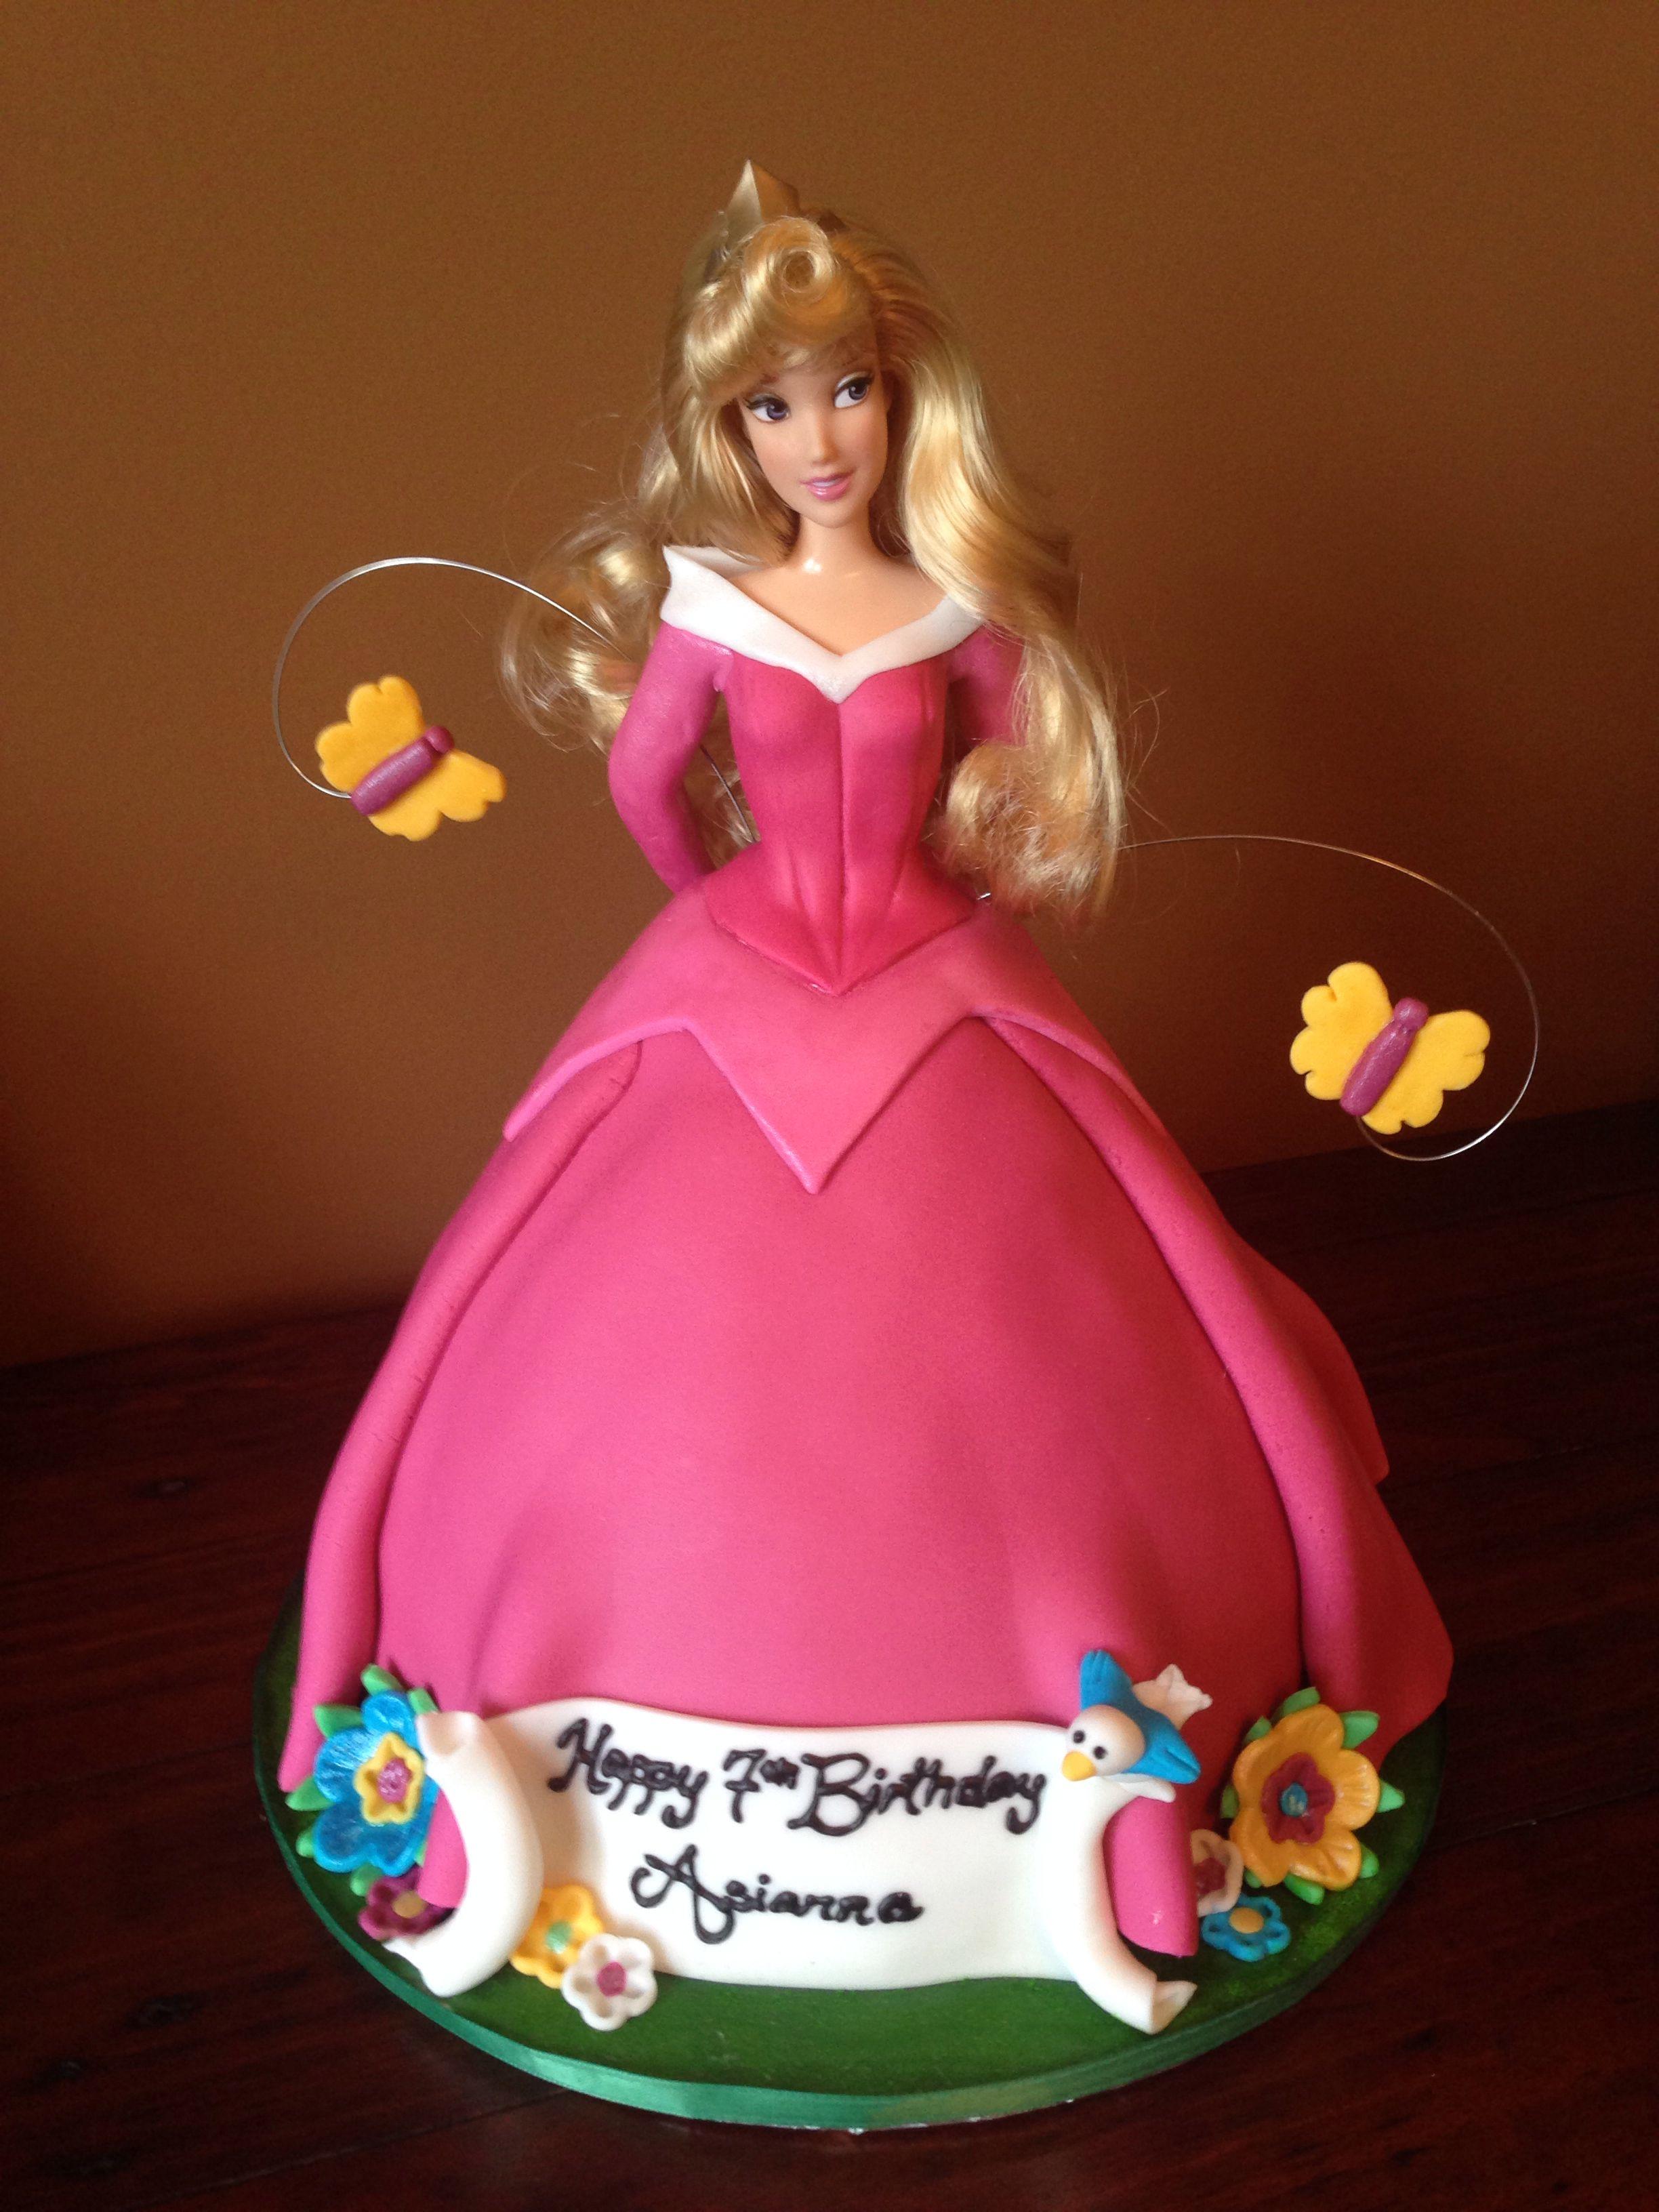 Princess Aurora Cake Design : Princess Aurora Cake kids  party ideas Pinterest